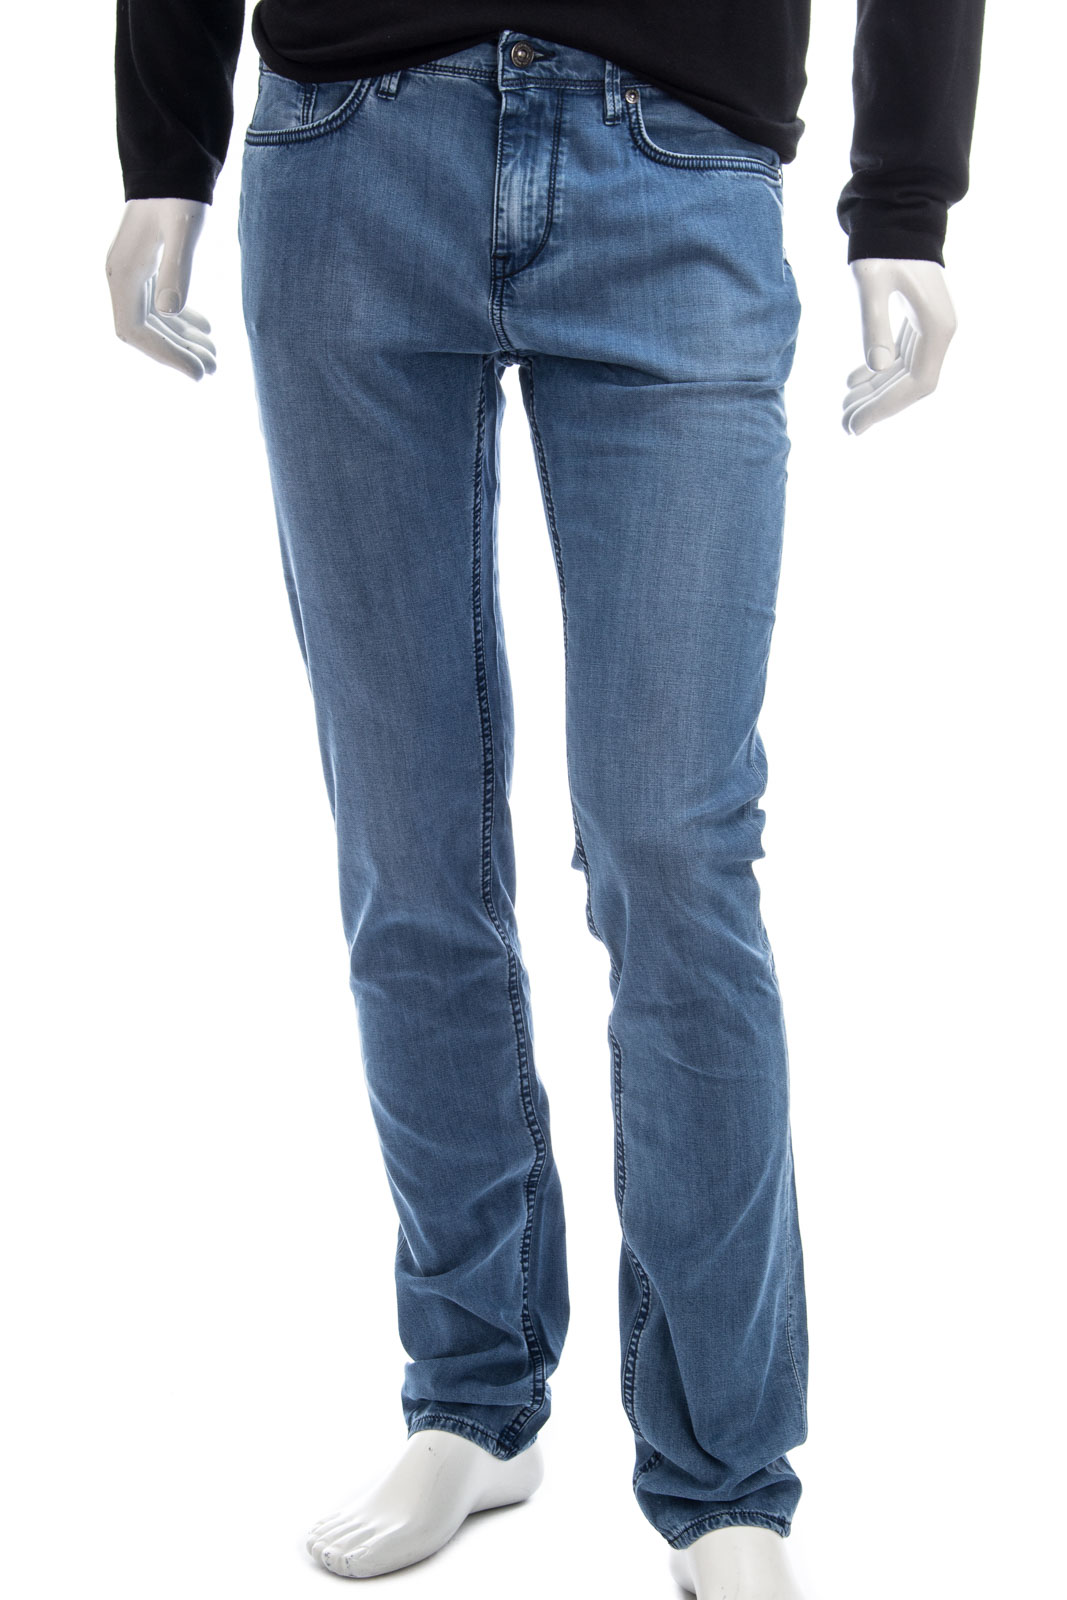 hugo boss charleston 3 jeans